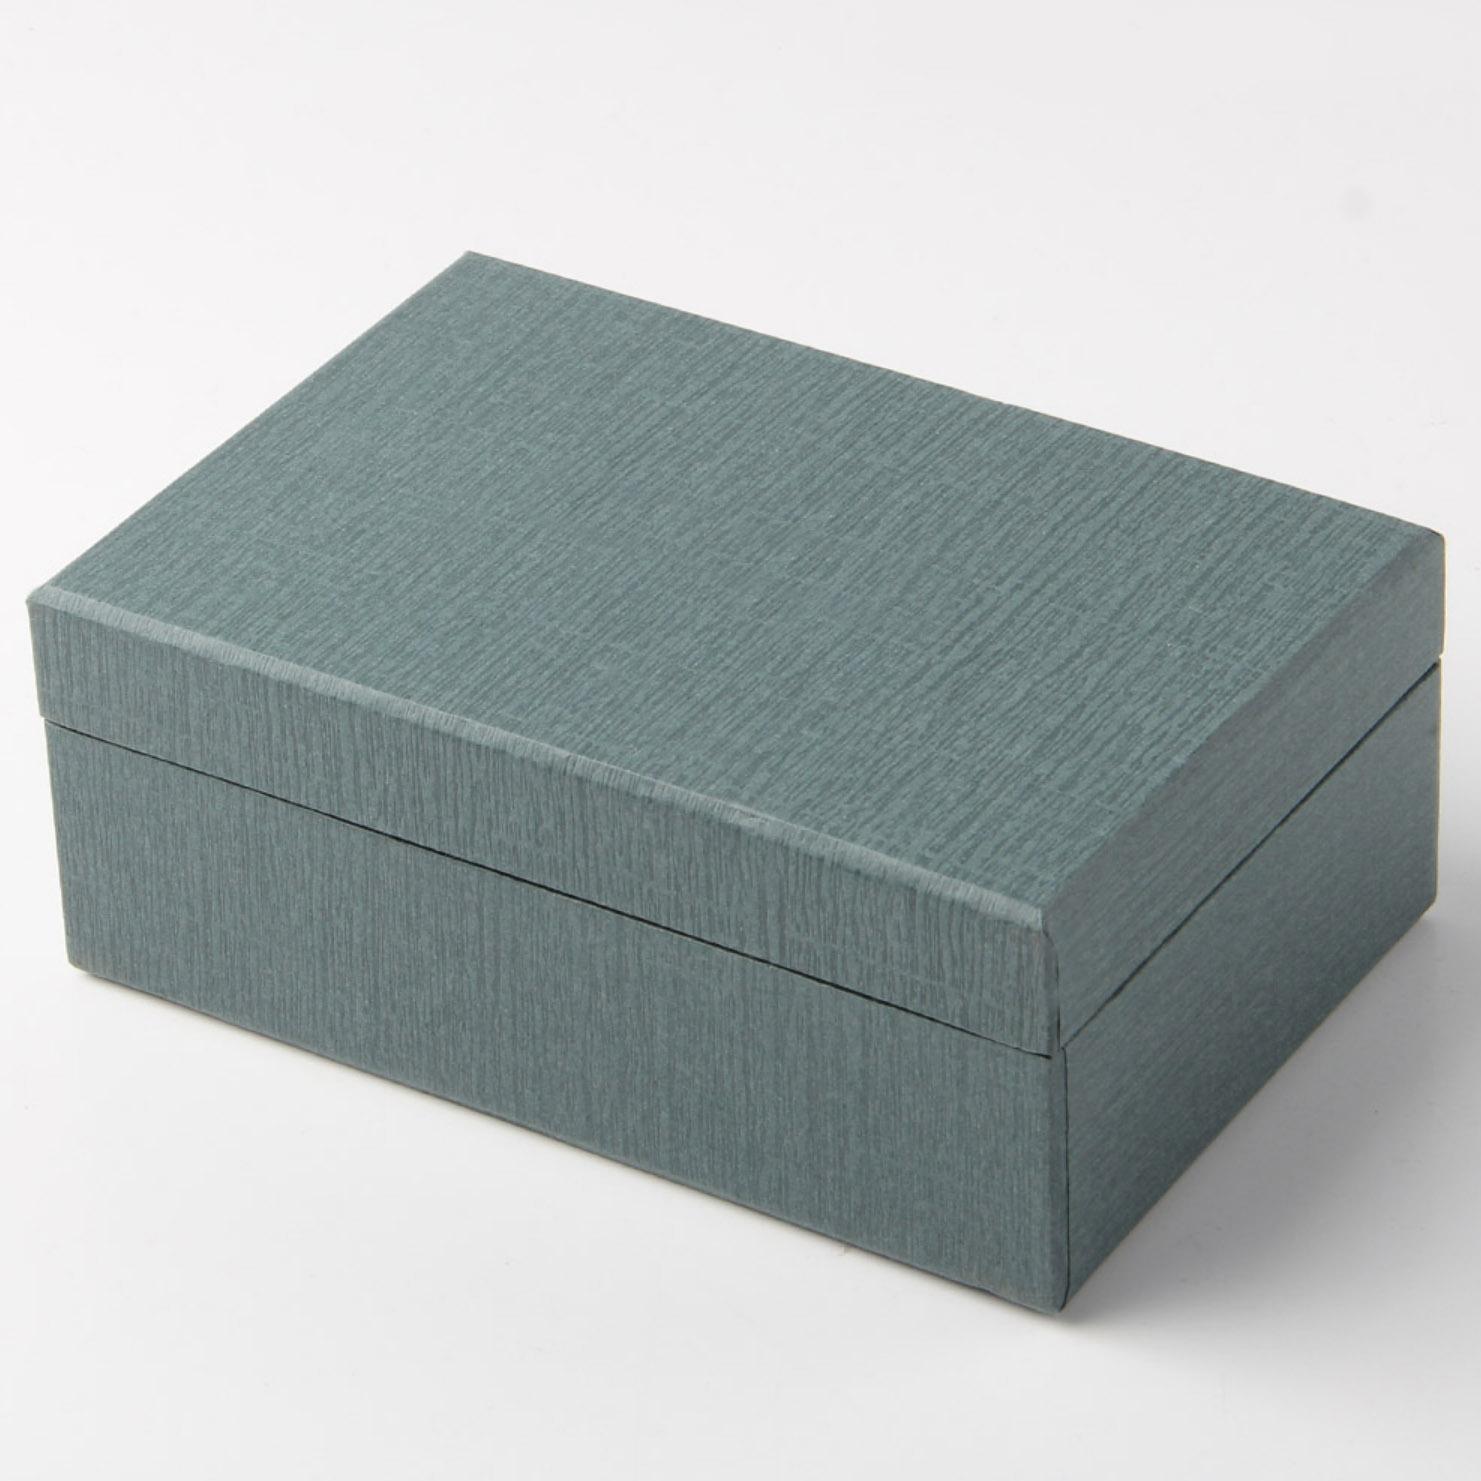 Handmade packaging box